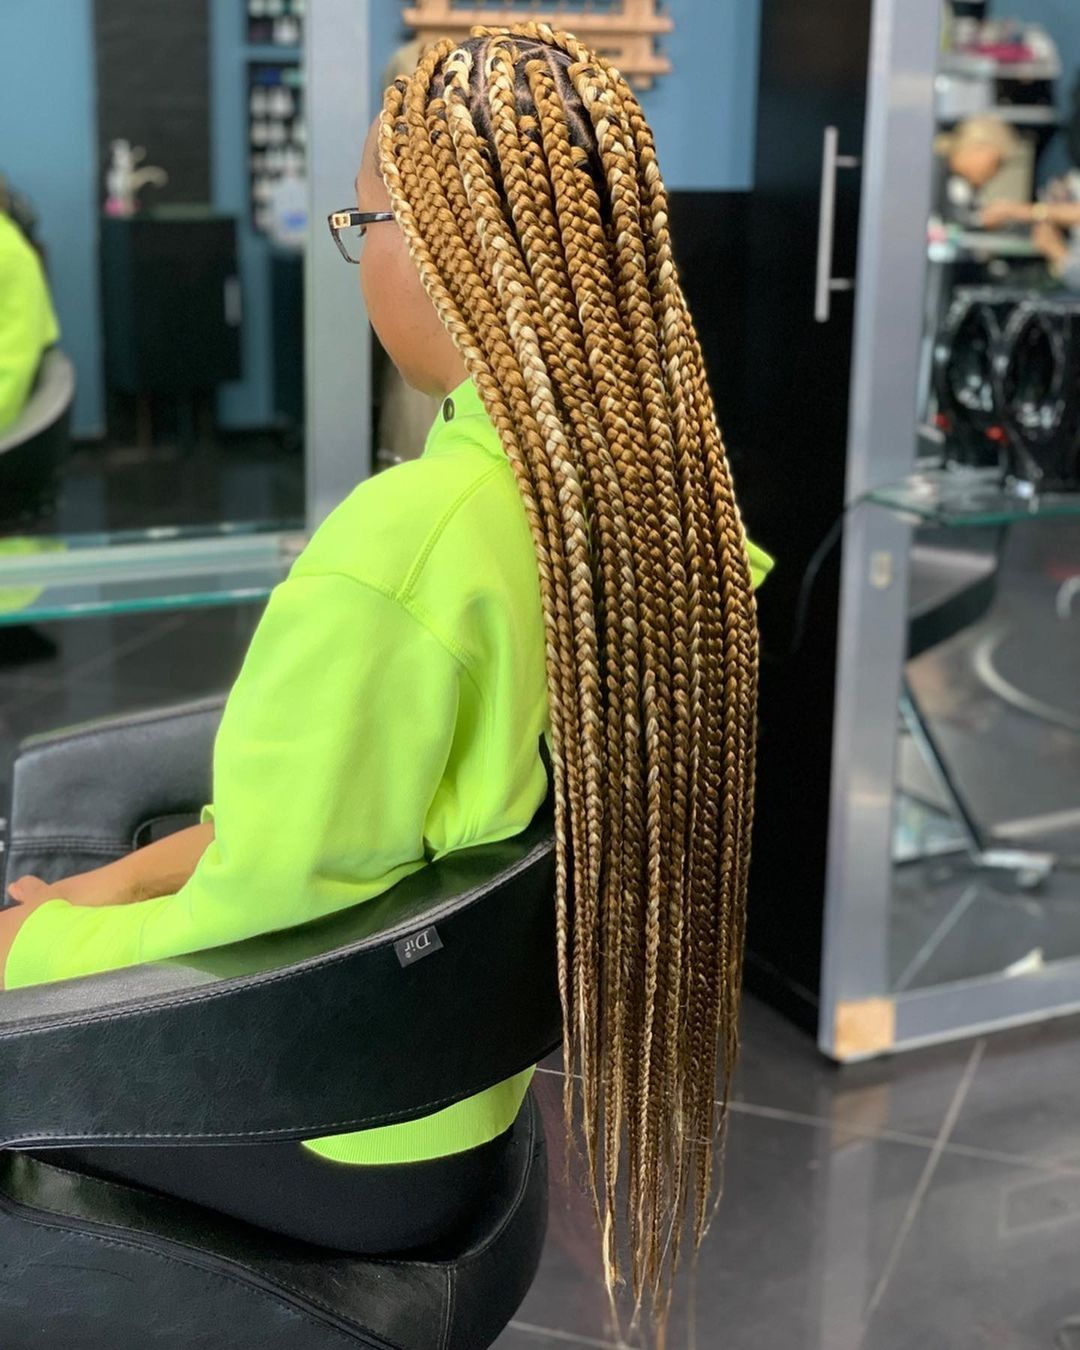 #largeboxbraids #largebraids #protectivestyles #bigbraids #largeknotlessbraids #hairstyles #melaninpoppin #blackbeauty #beauty #fashion #trends #quote #fancyhair #protectivestyles